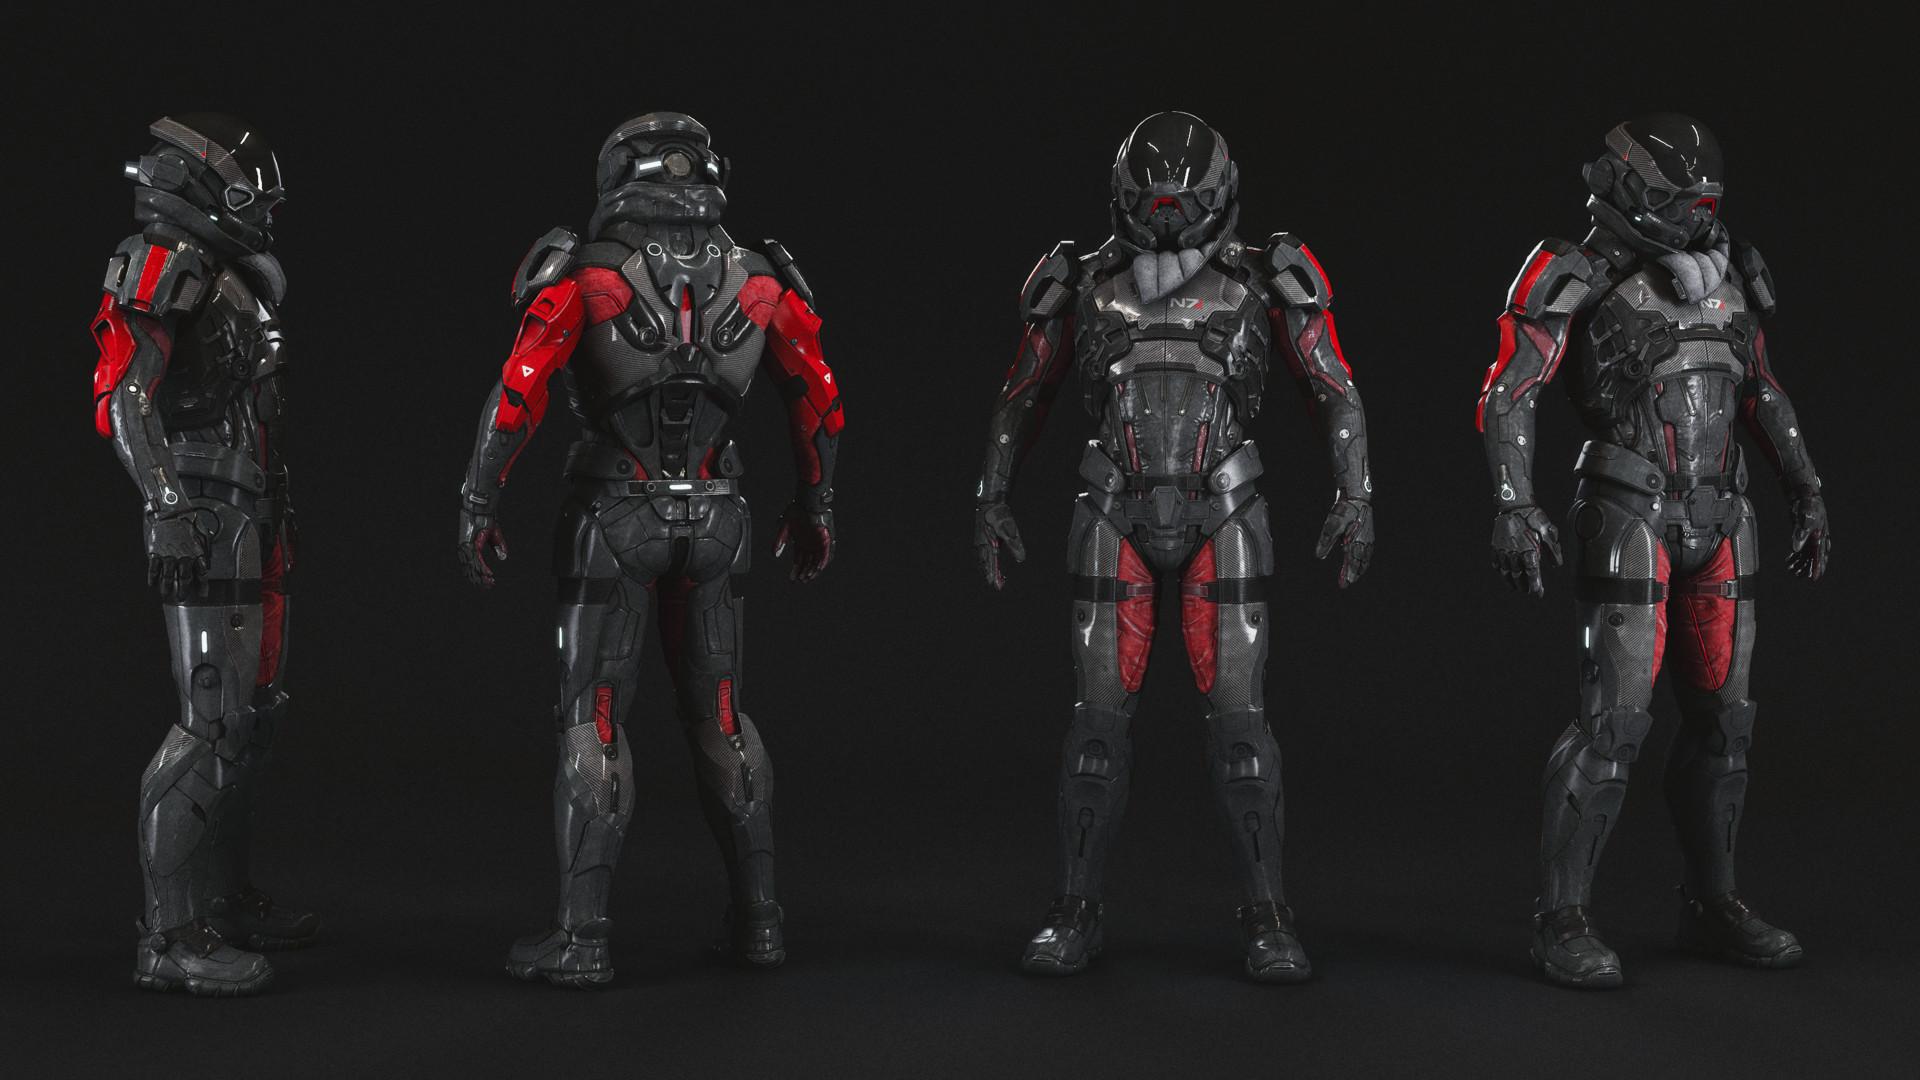 N7 Armor Mass Effect Andromeda: Pathfinder Armor Mass Effect Andromeda